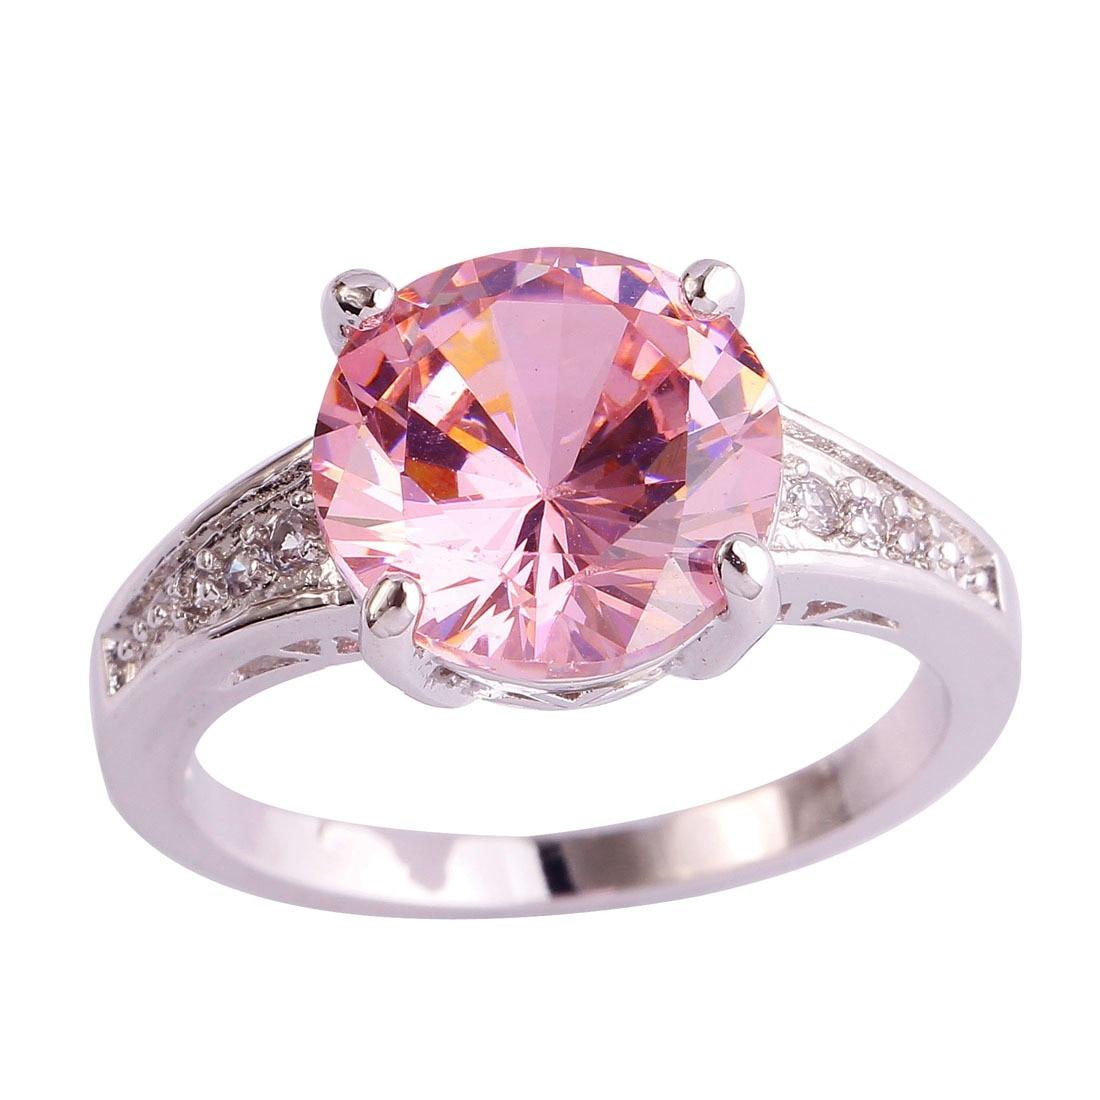 5%Off Uloveido 2Pcs Silver Color Cubic Zirconia Wedding Commitment ...